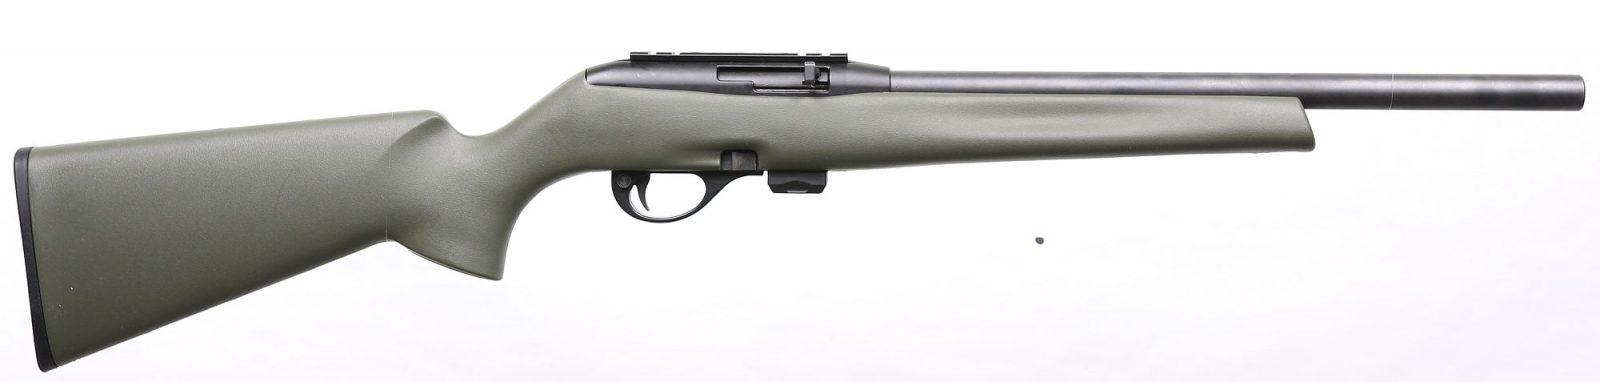 Remington 597 Heavy Barrel